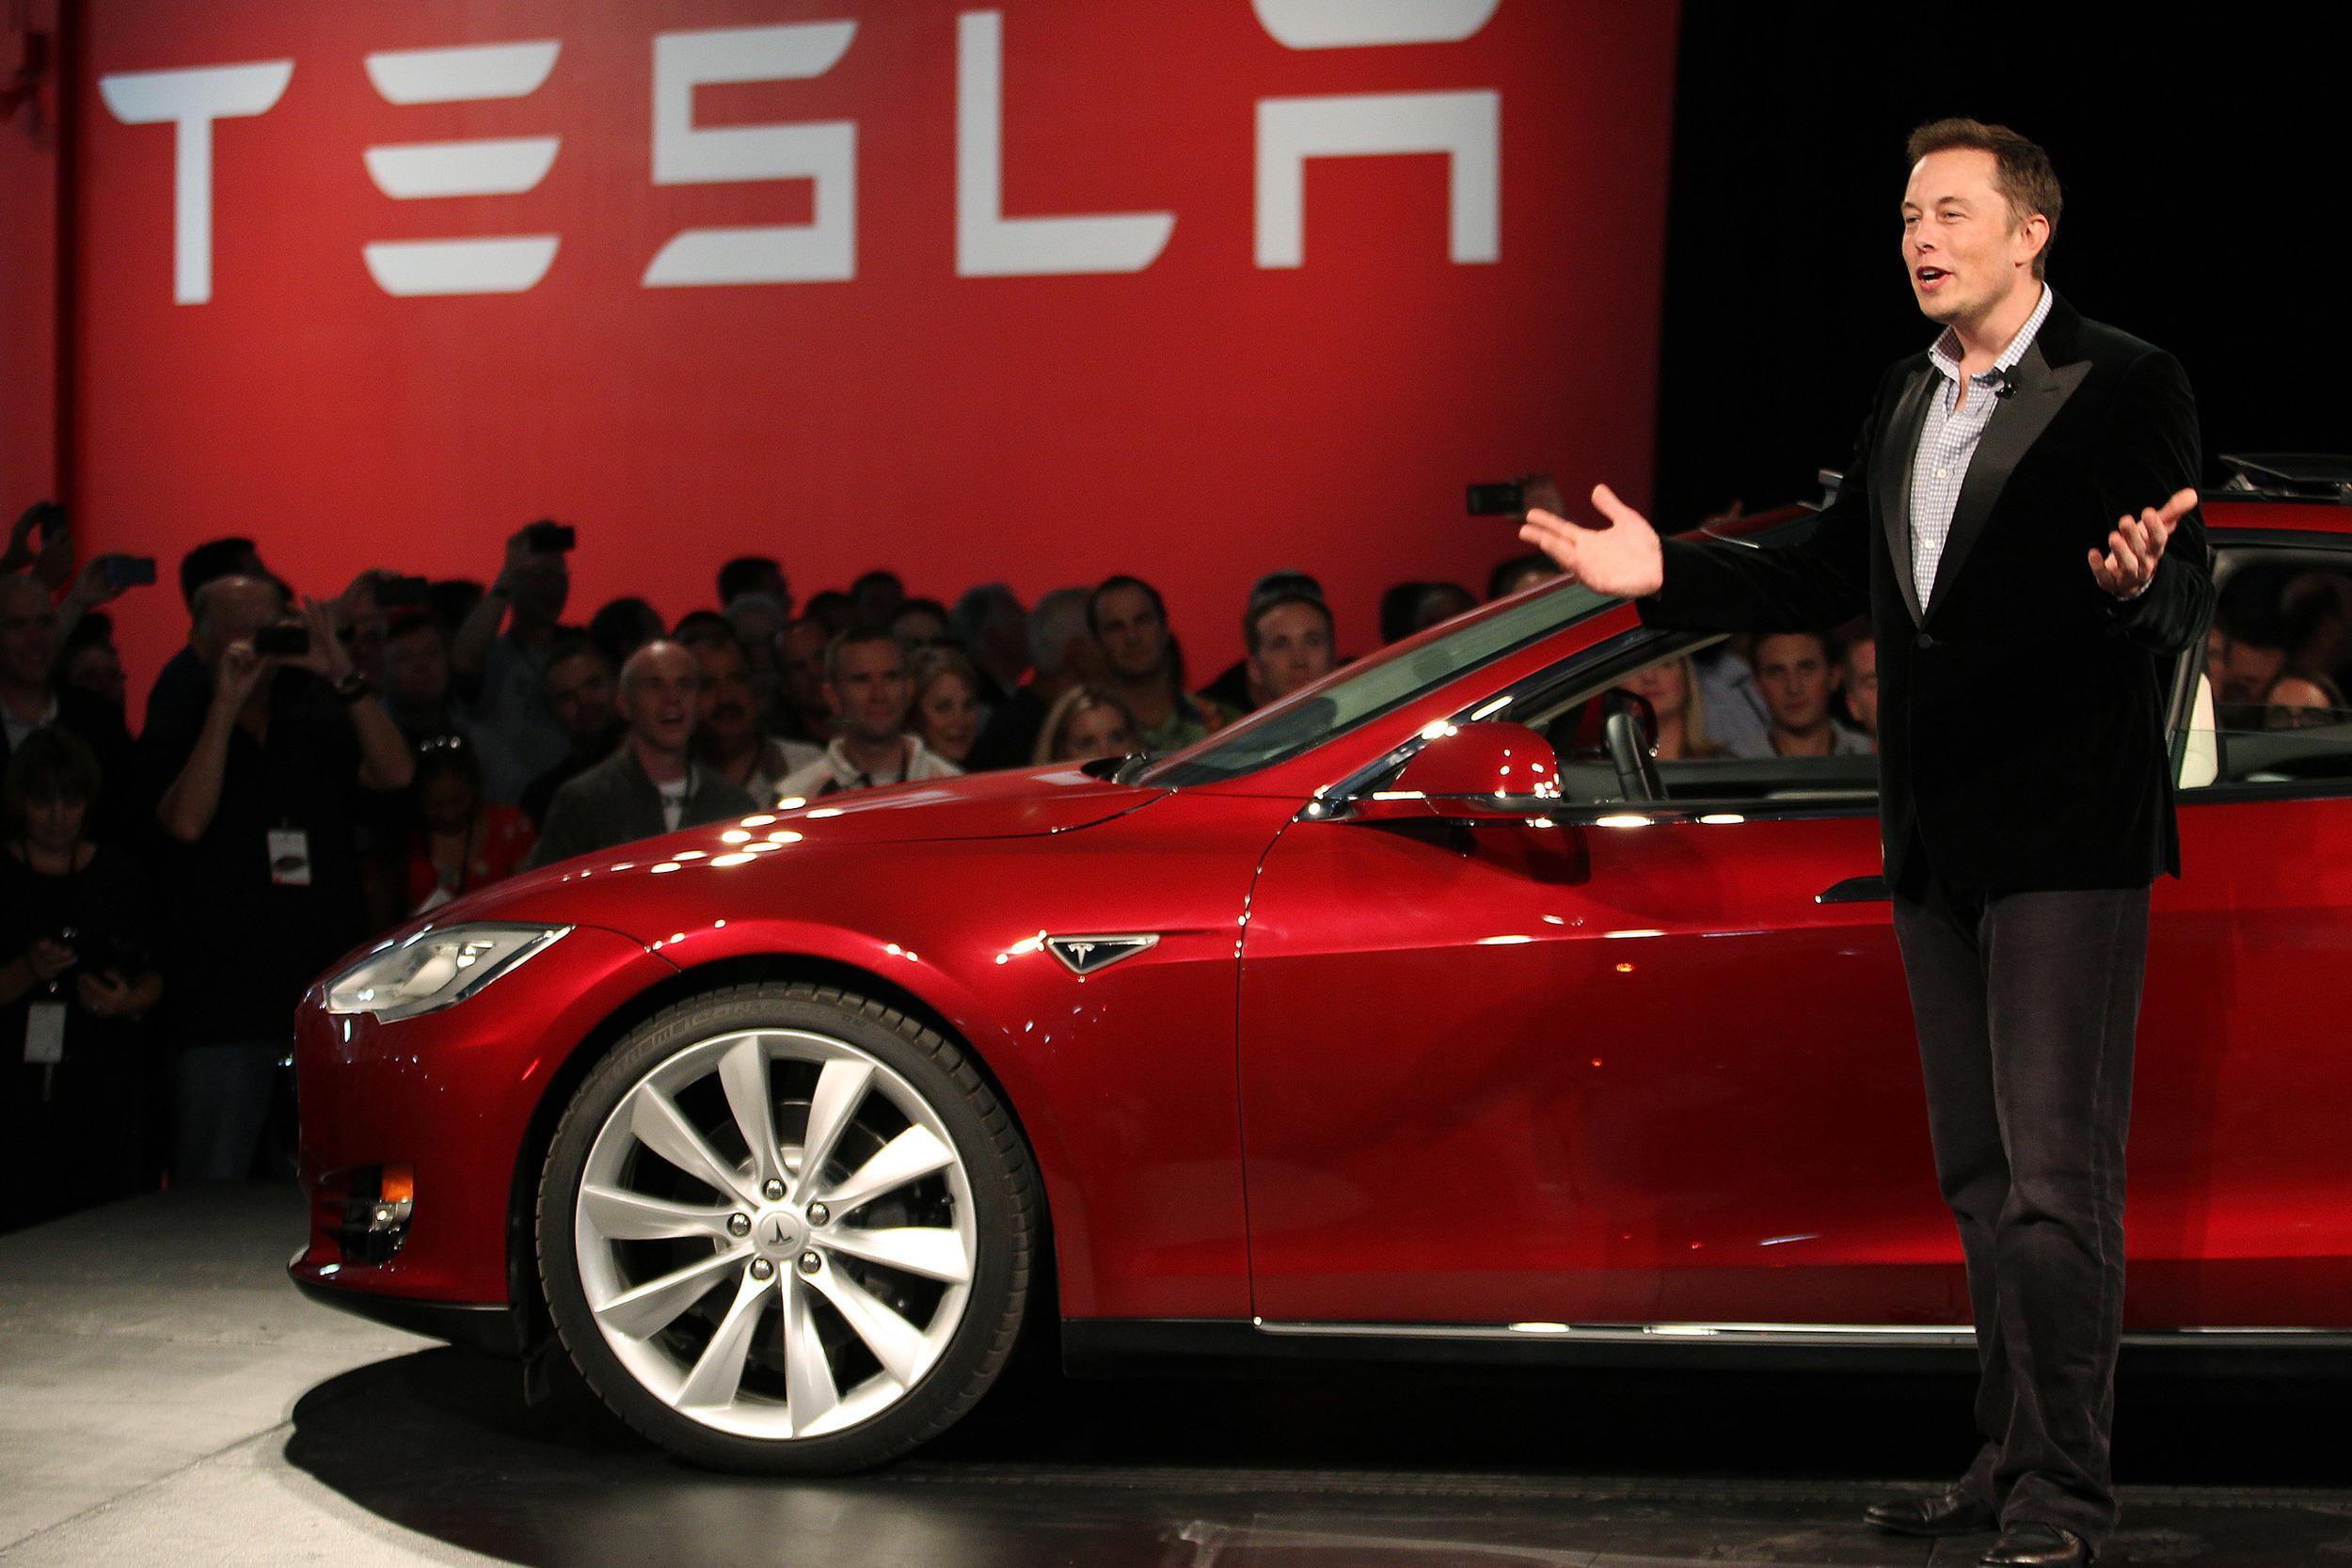 Tesla's Model 3 to Cost $35K,